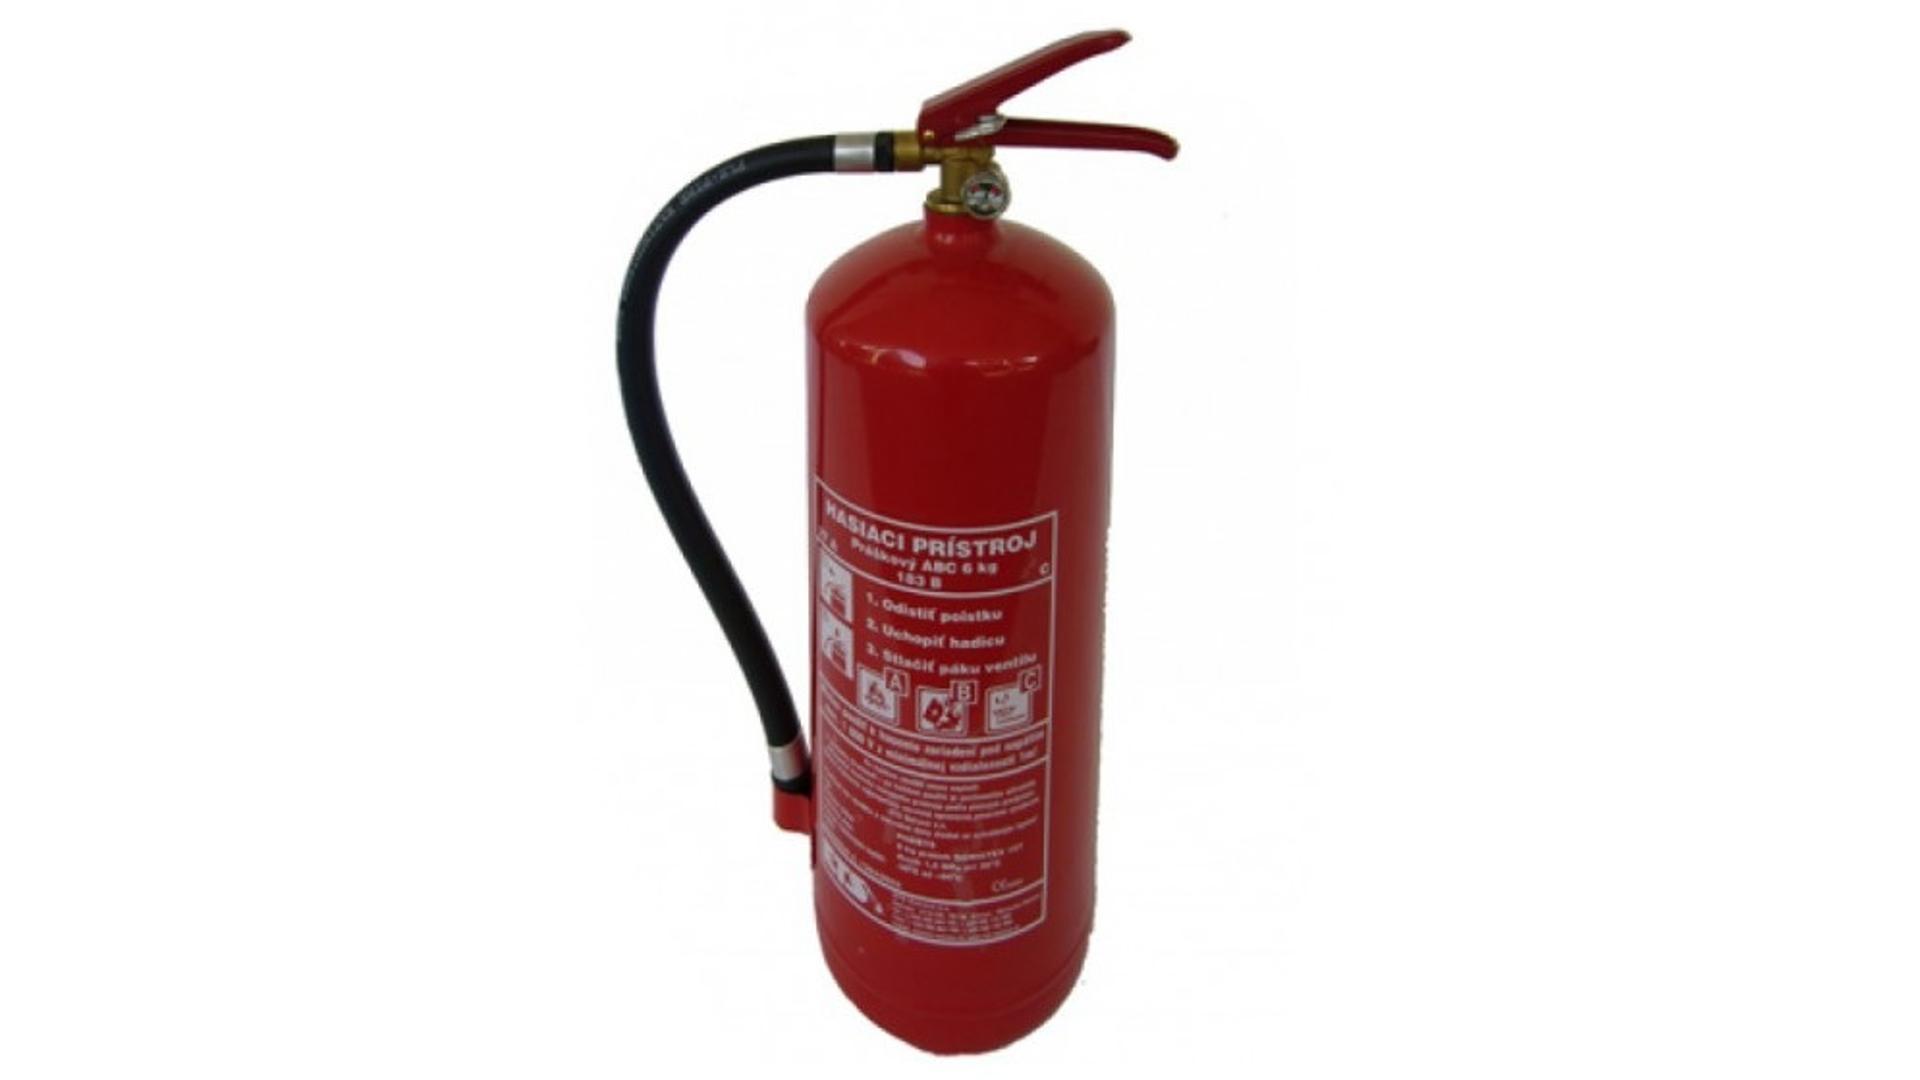 4CARS Fire extinguisher 6kg